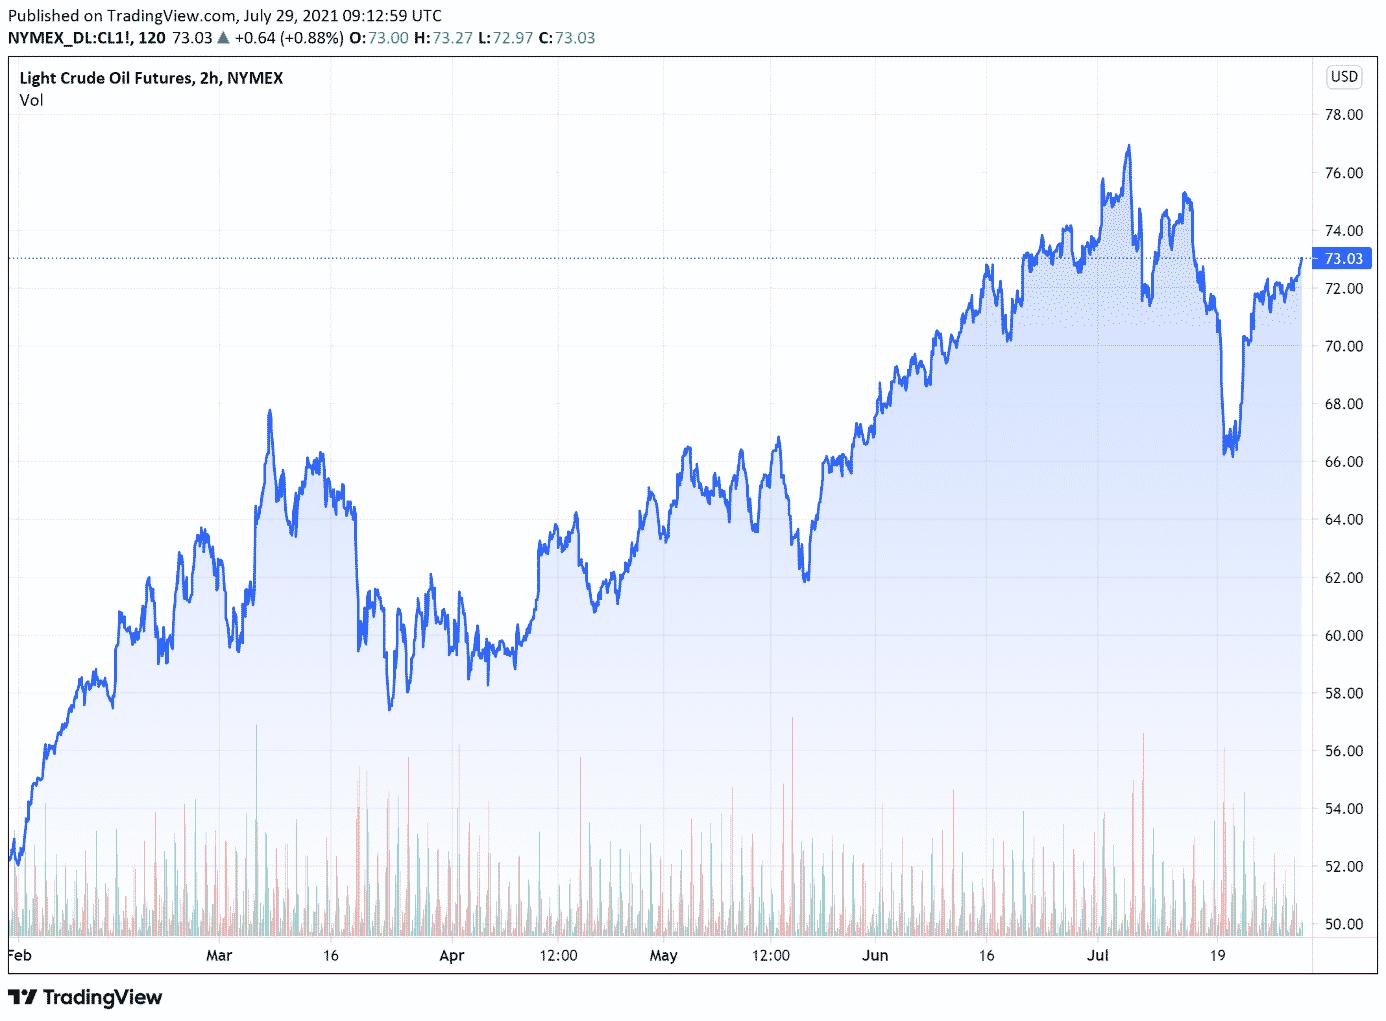 cours petrole wti (baril en $) jeudi 29 juillet 2021